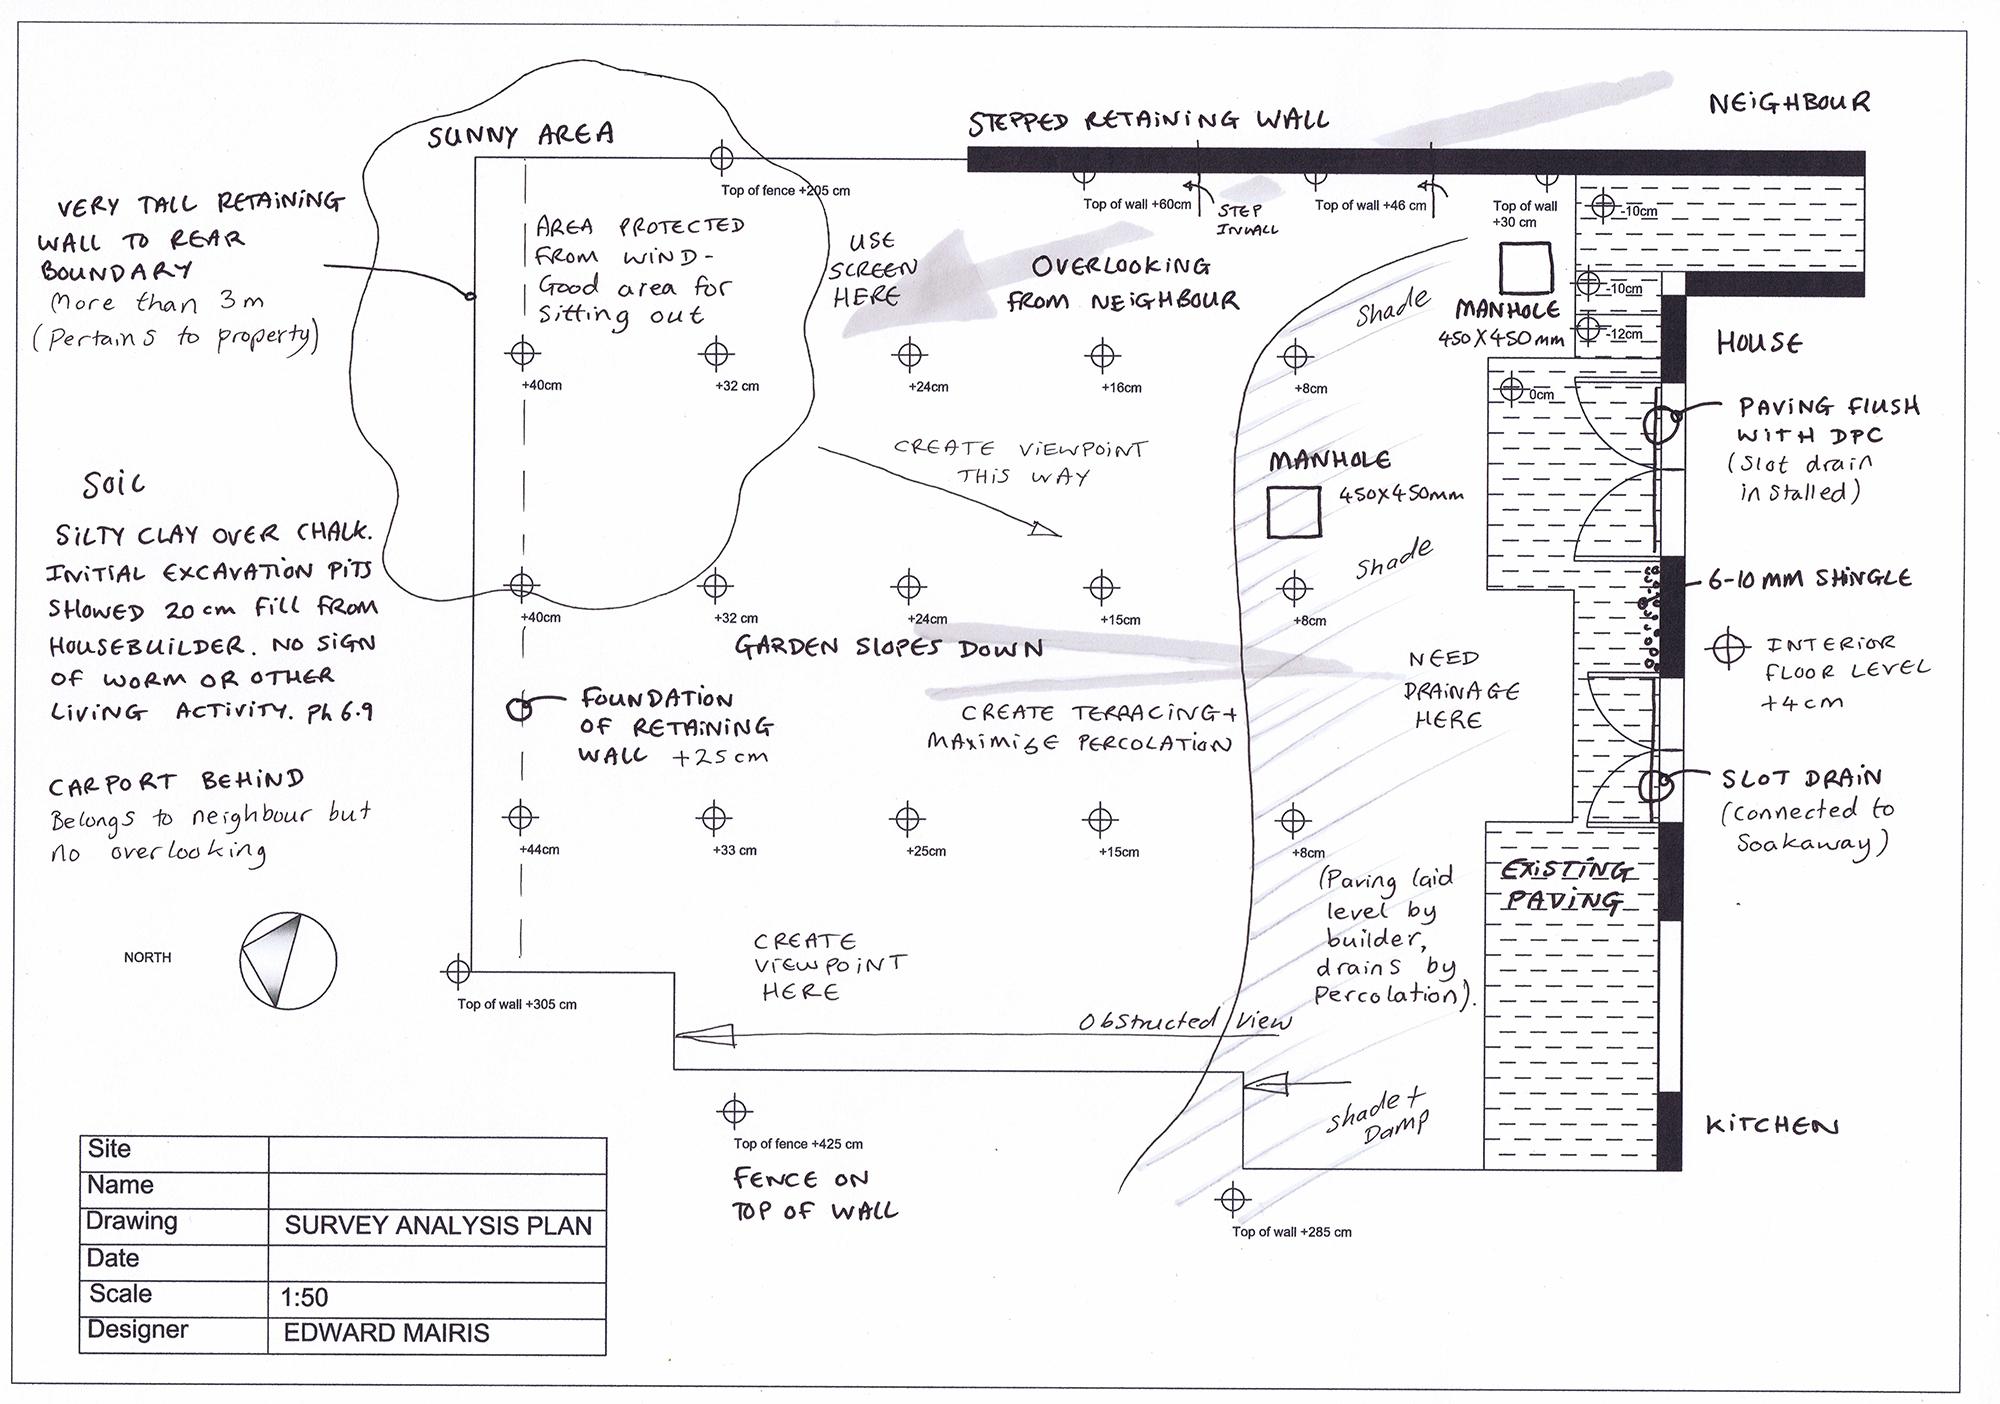 Surveying_SGD-17041-Project-Three-Survey-Analysis.jpg